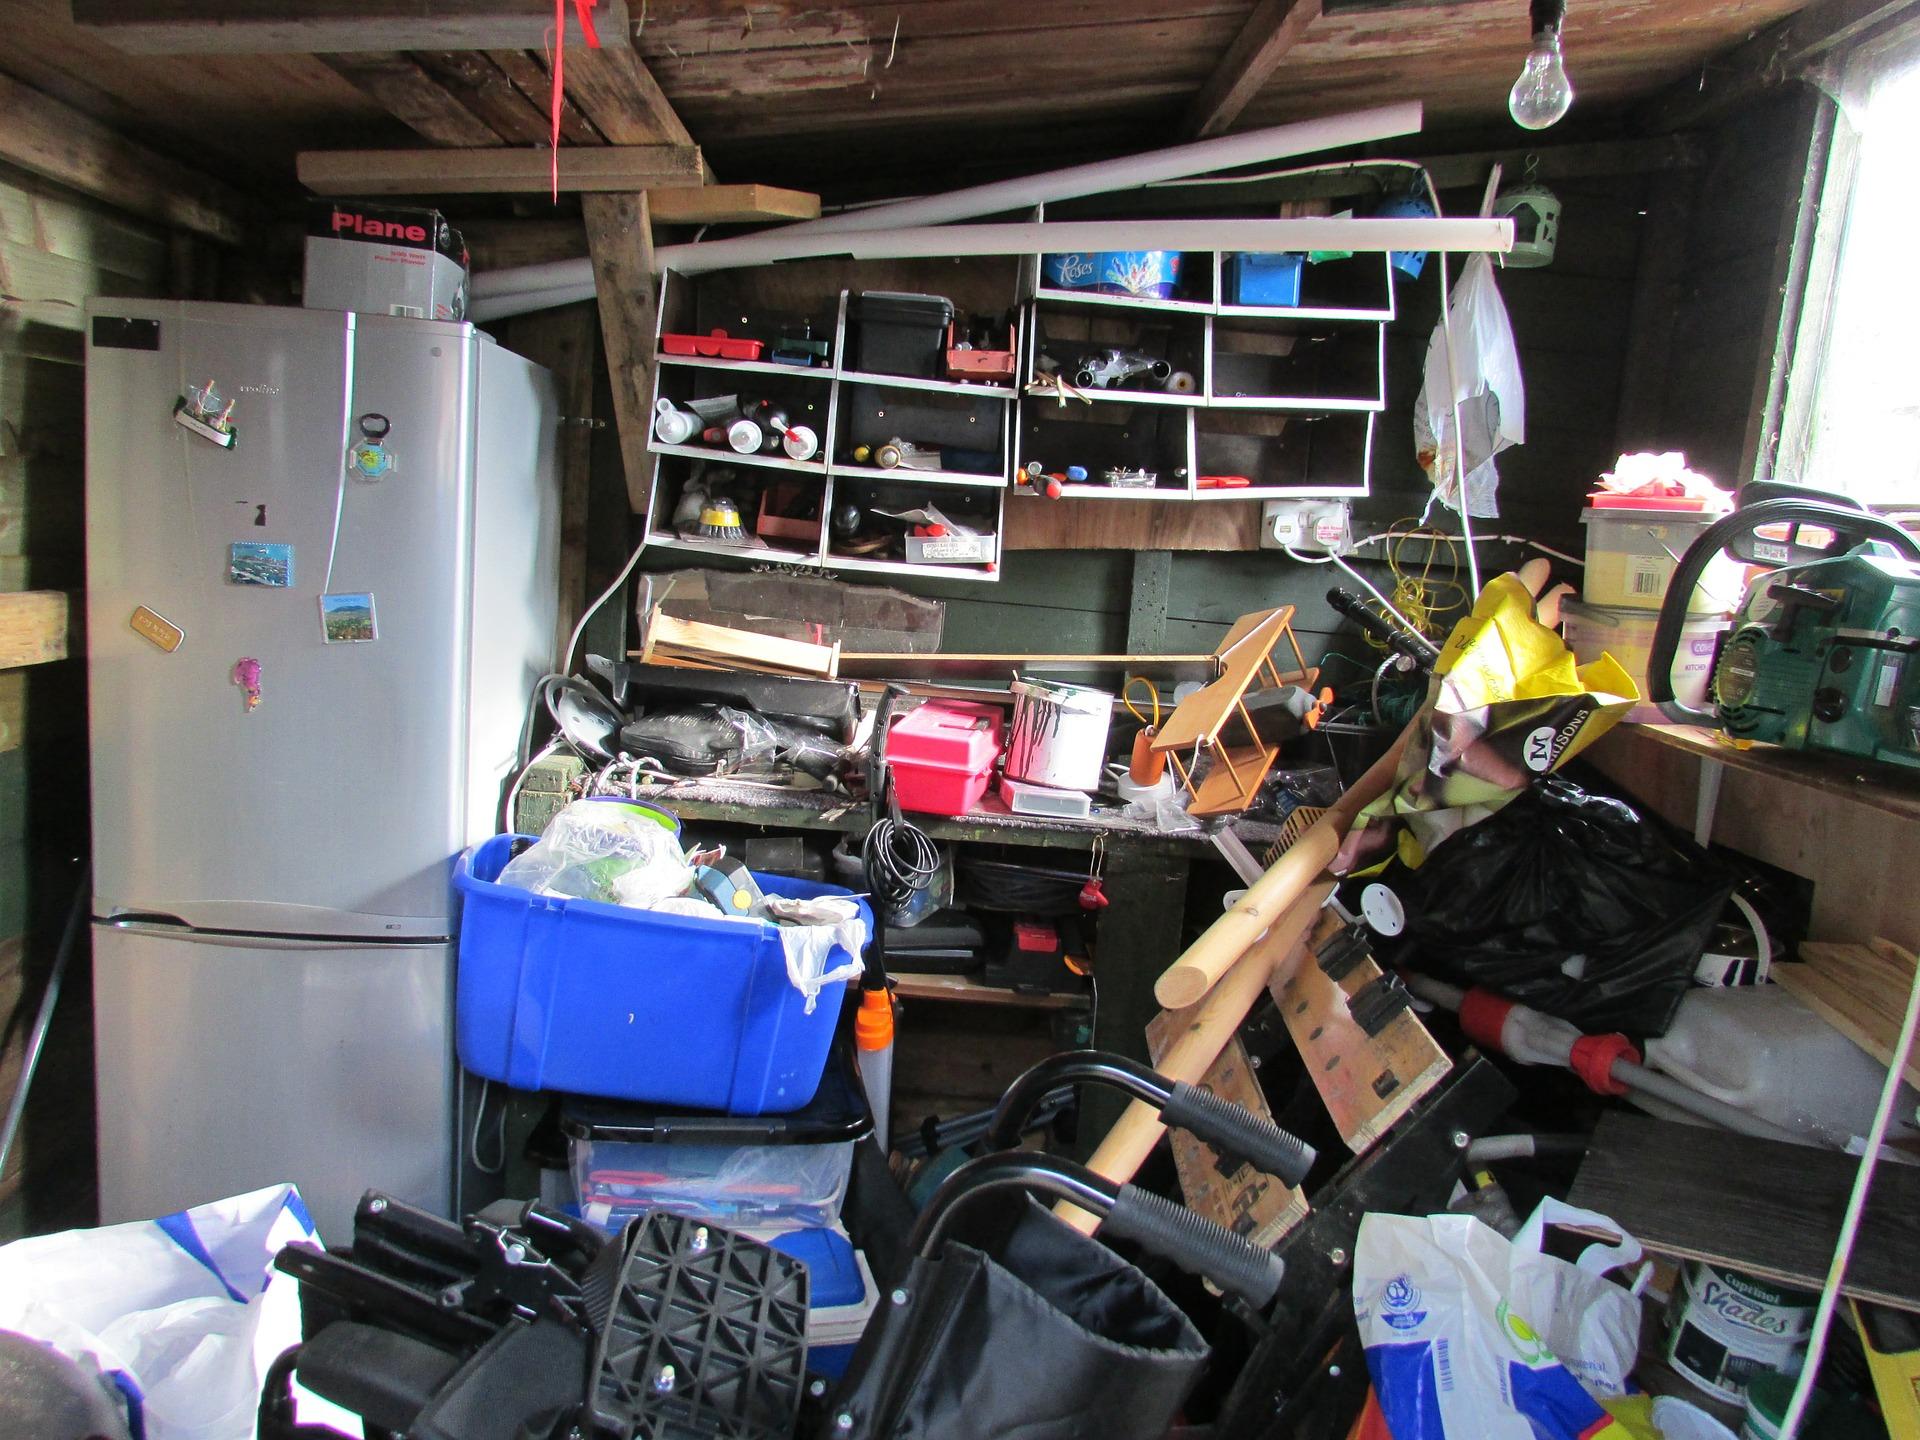 Photo of clutter on Pixabay by Kasman